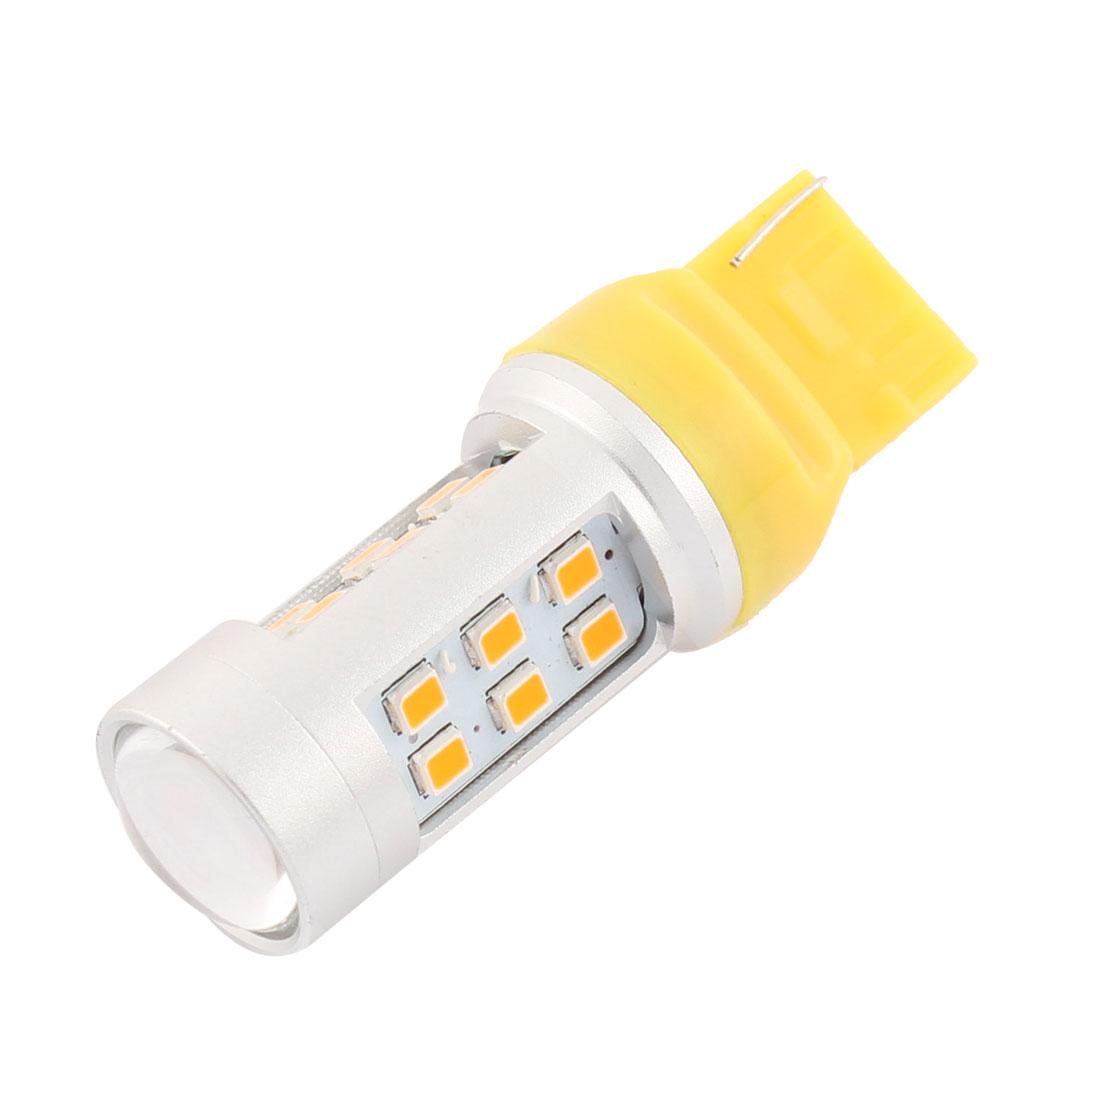 T20 W21W Yellow 21 LED Car Auto Reverse Signal Light Lamp Bulb 12V